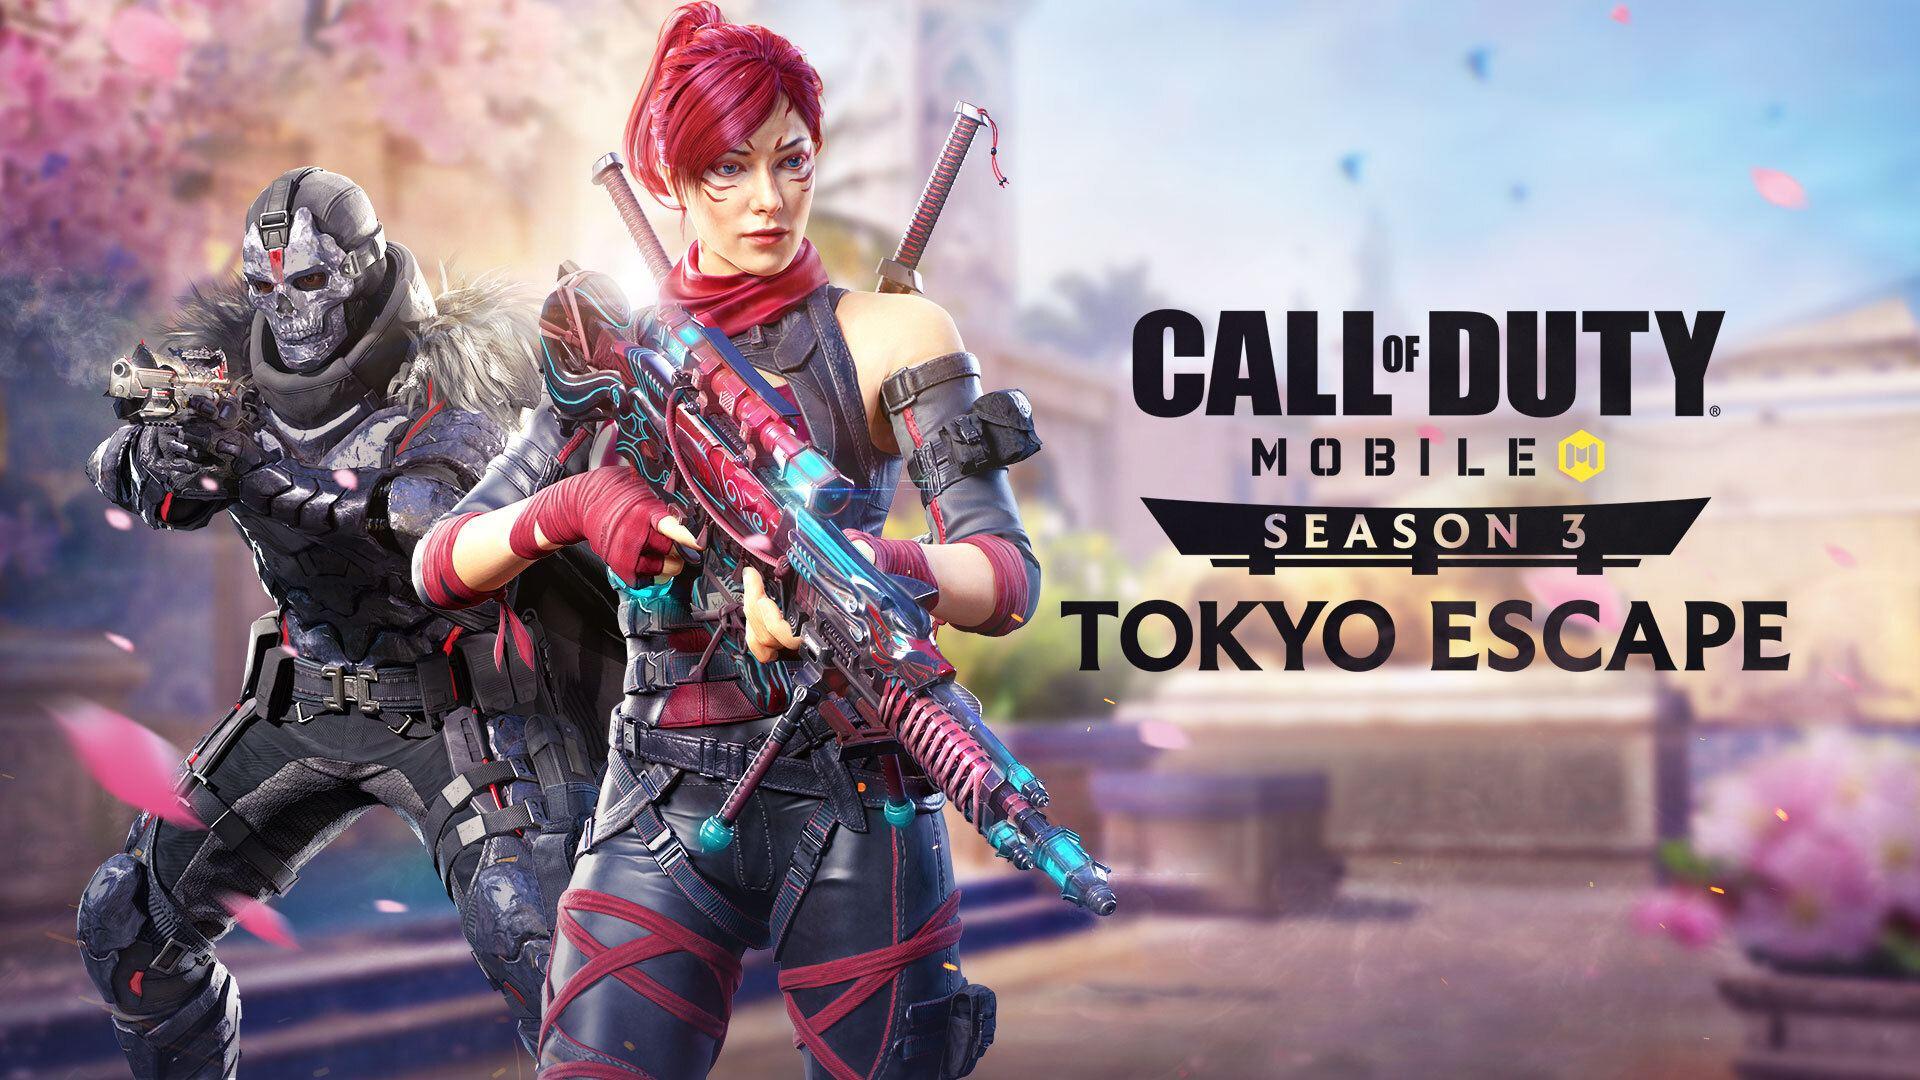 Call of Duty Mobile Staffel 3 bringt uns nach Japan mit neuem Tokyo Escape Kapitel